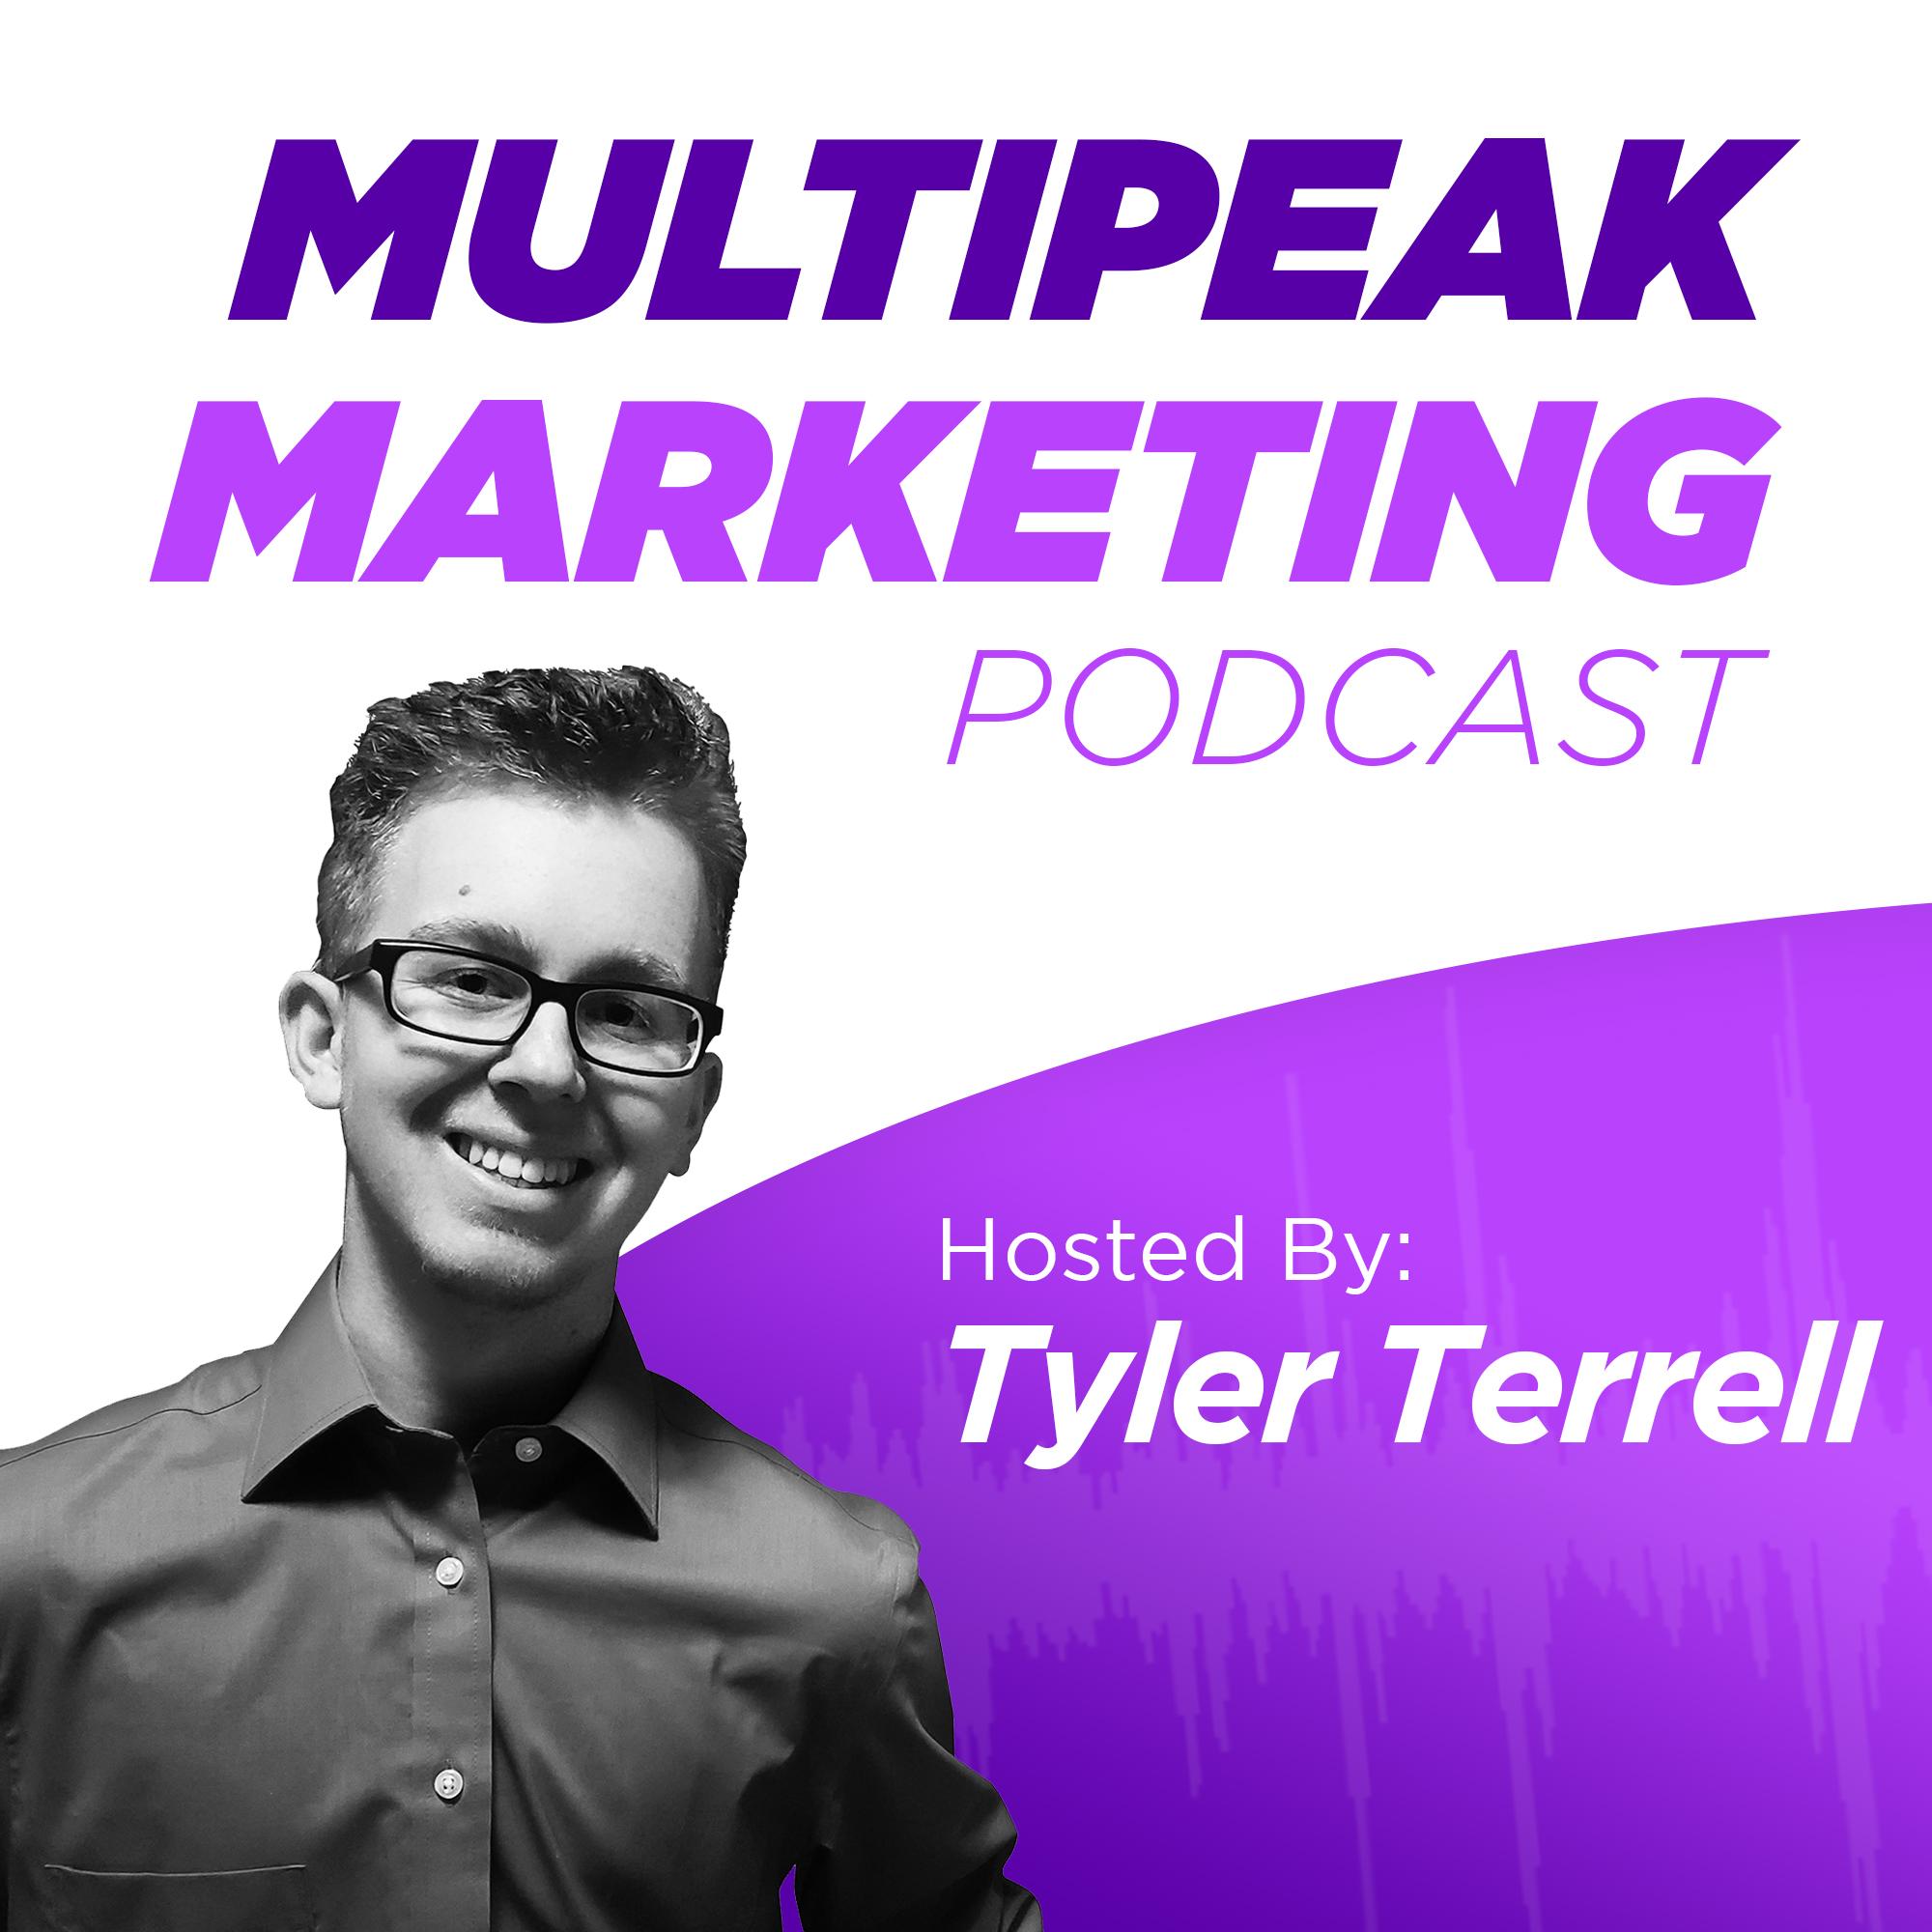 Dr. Jason Rothenberg - Multipeak Marketing Podcast - Episode 1 show art